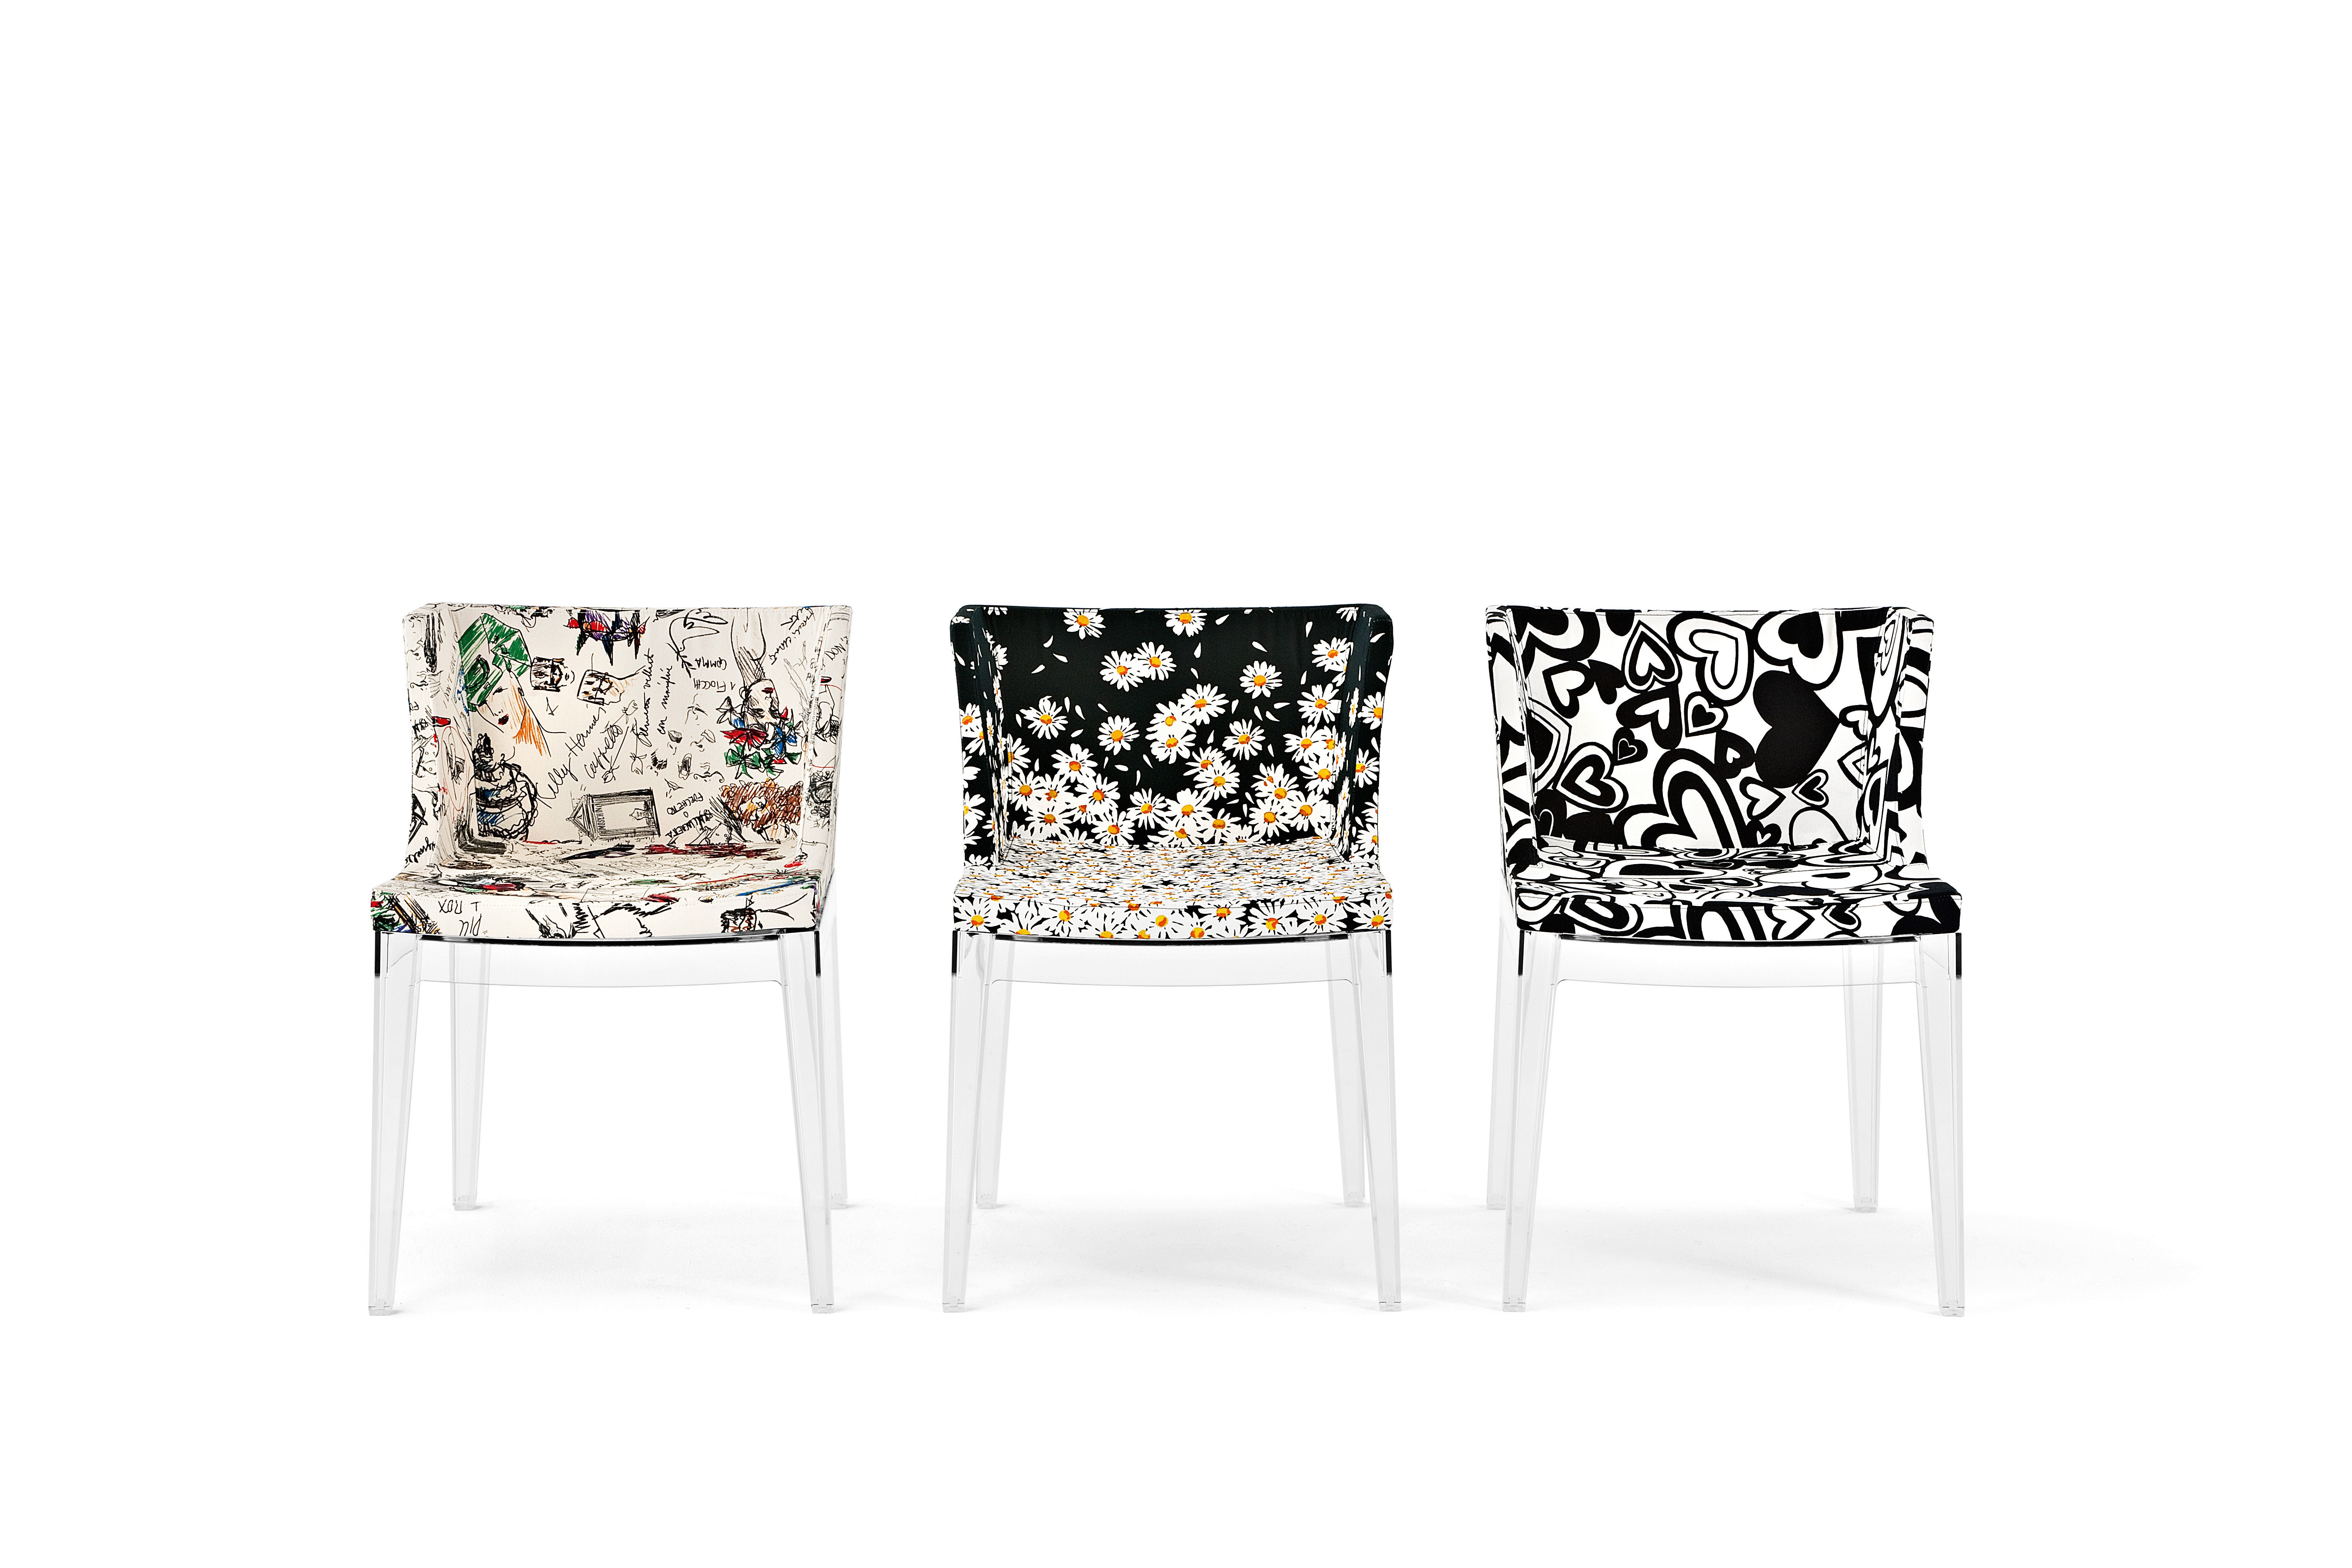 fauteuil rembourr mademoiselle moschino tissu pieds transparents esquisse kartell. Black Bedroom Furniture Sets. Home Design Ideas